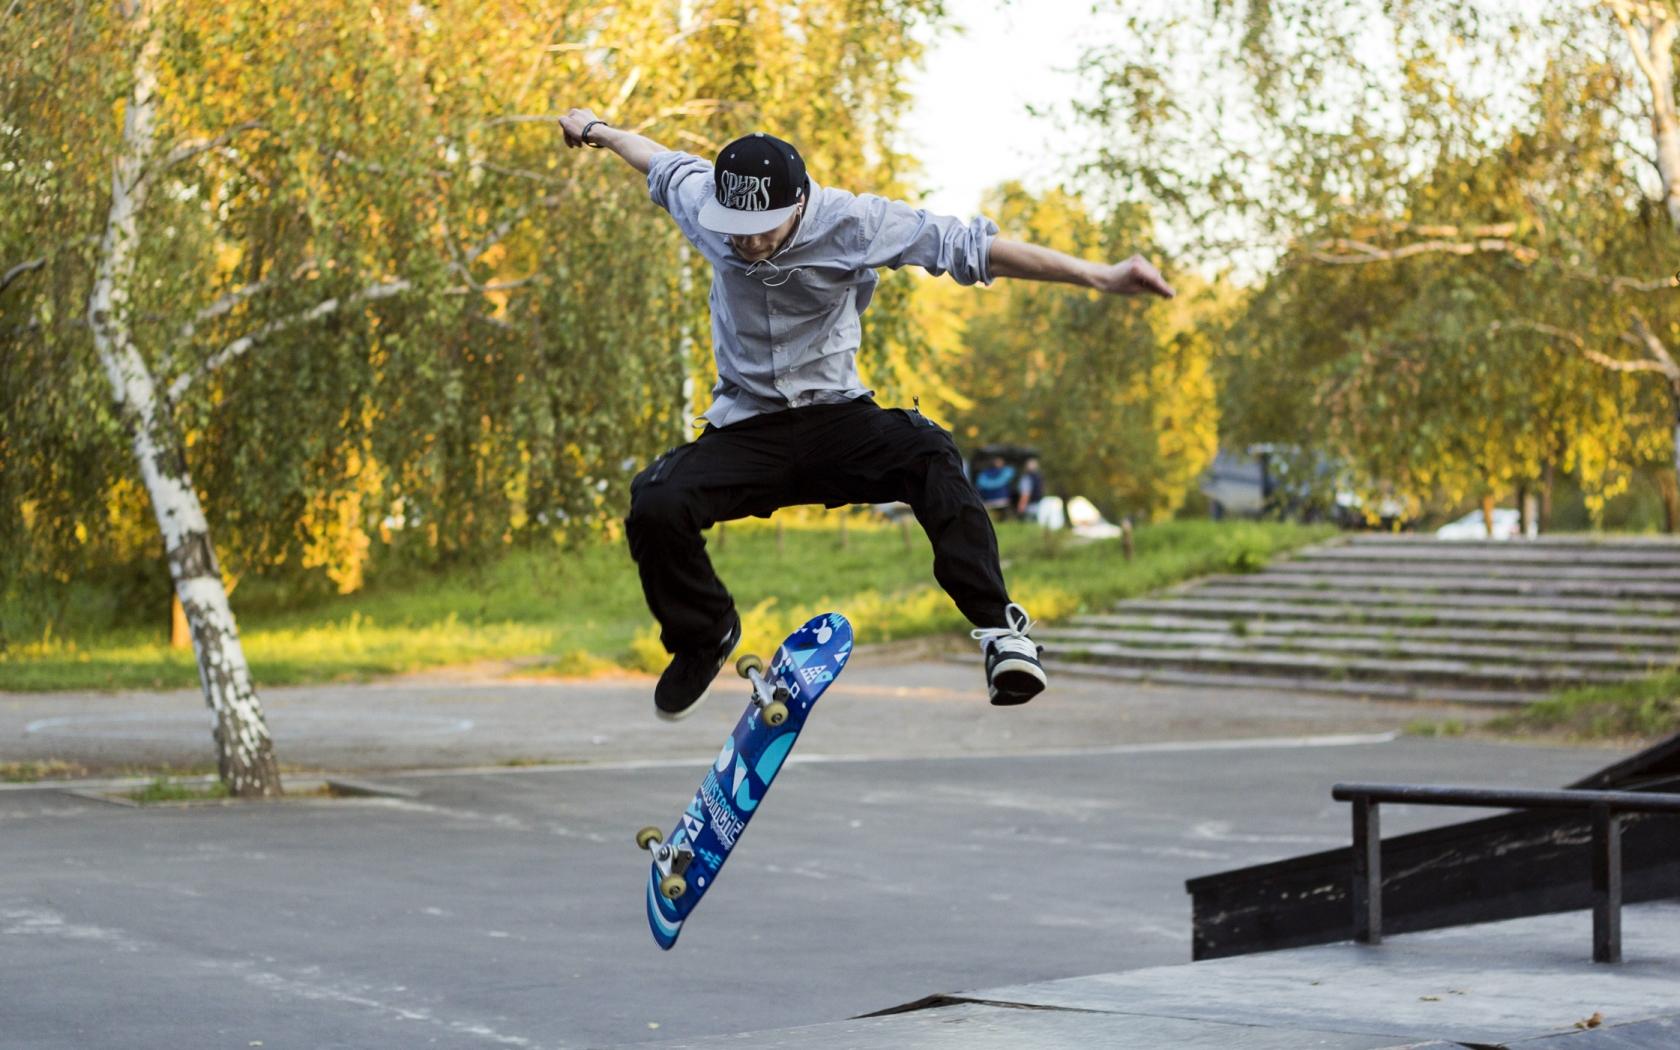 Trucos con skate - 1680x1050